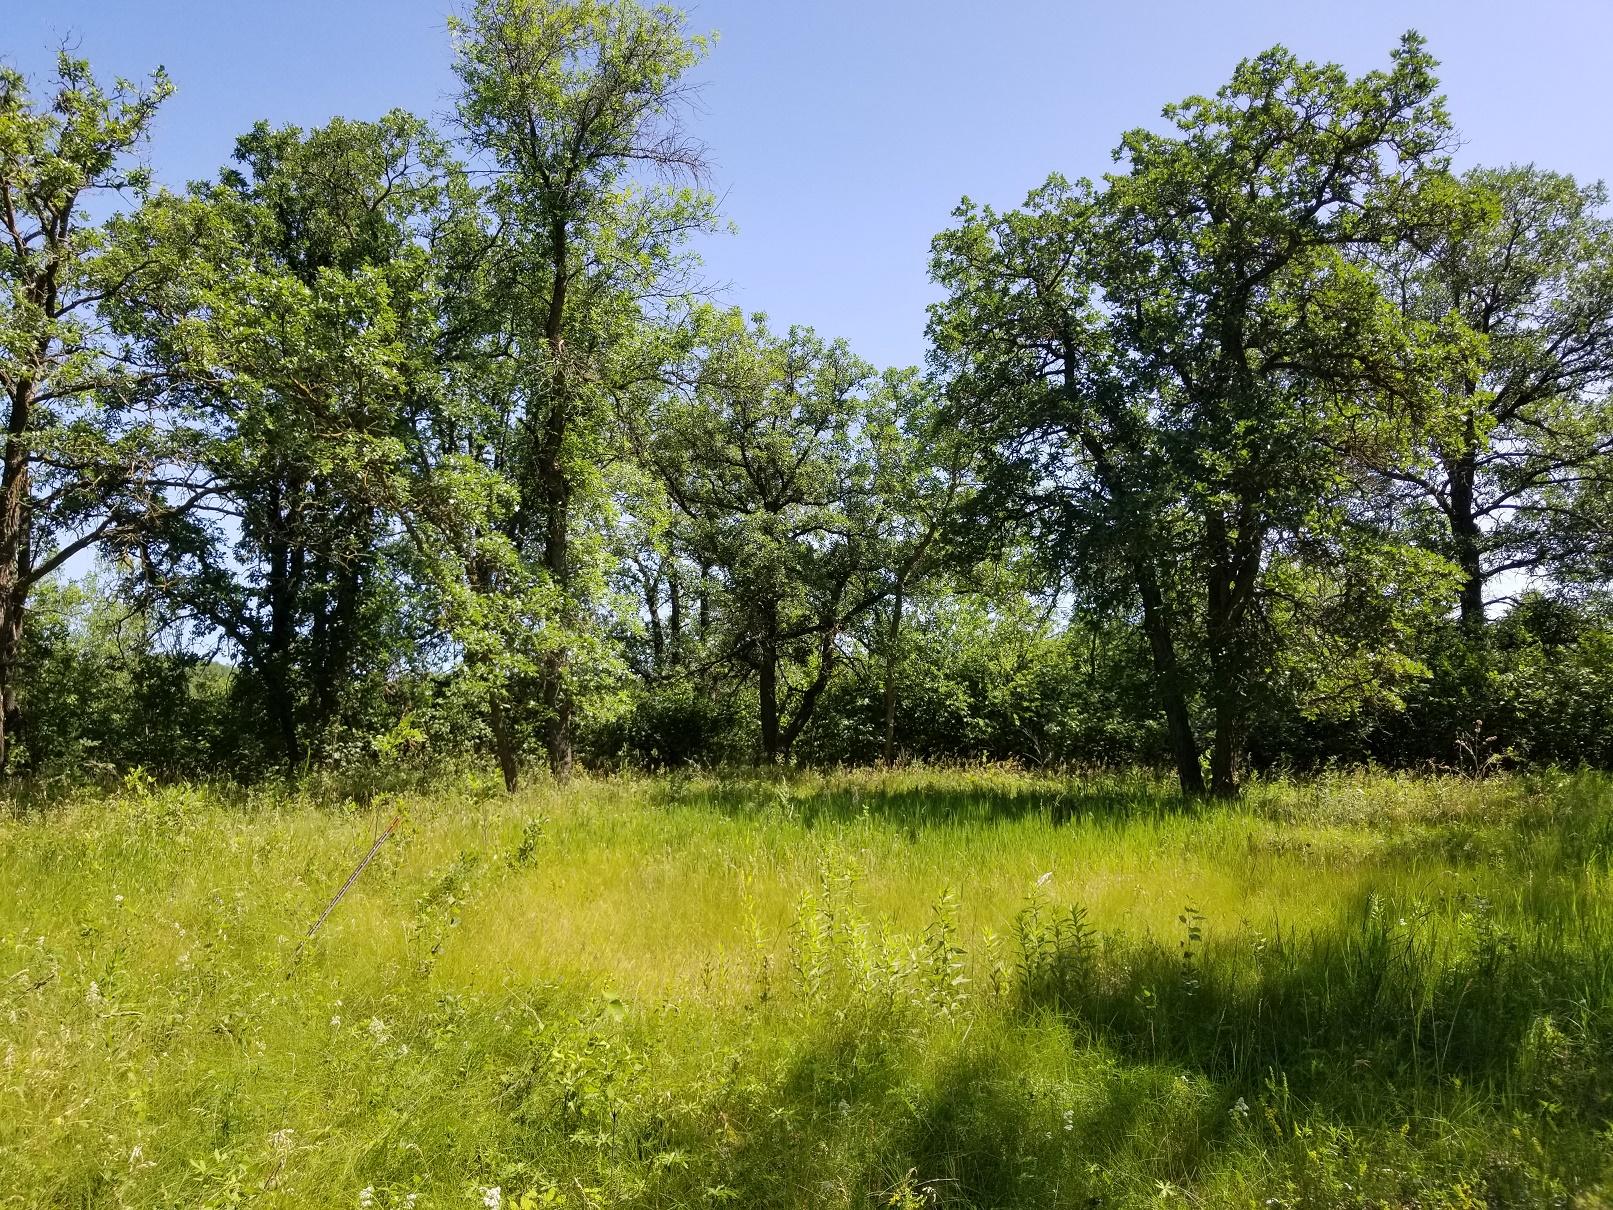 Rural, For Sale, 101st street Ave, Listing ID 1246, Bottineau, North Dakota, United States, 58318,